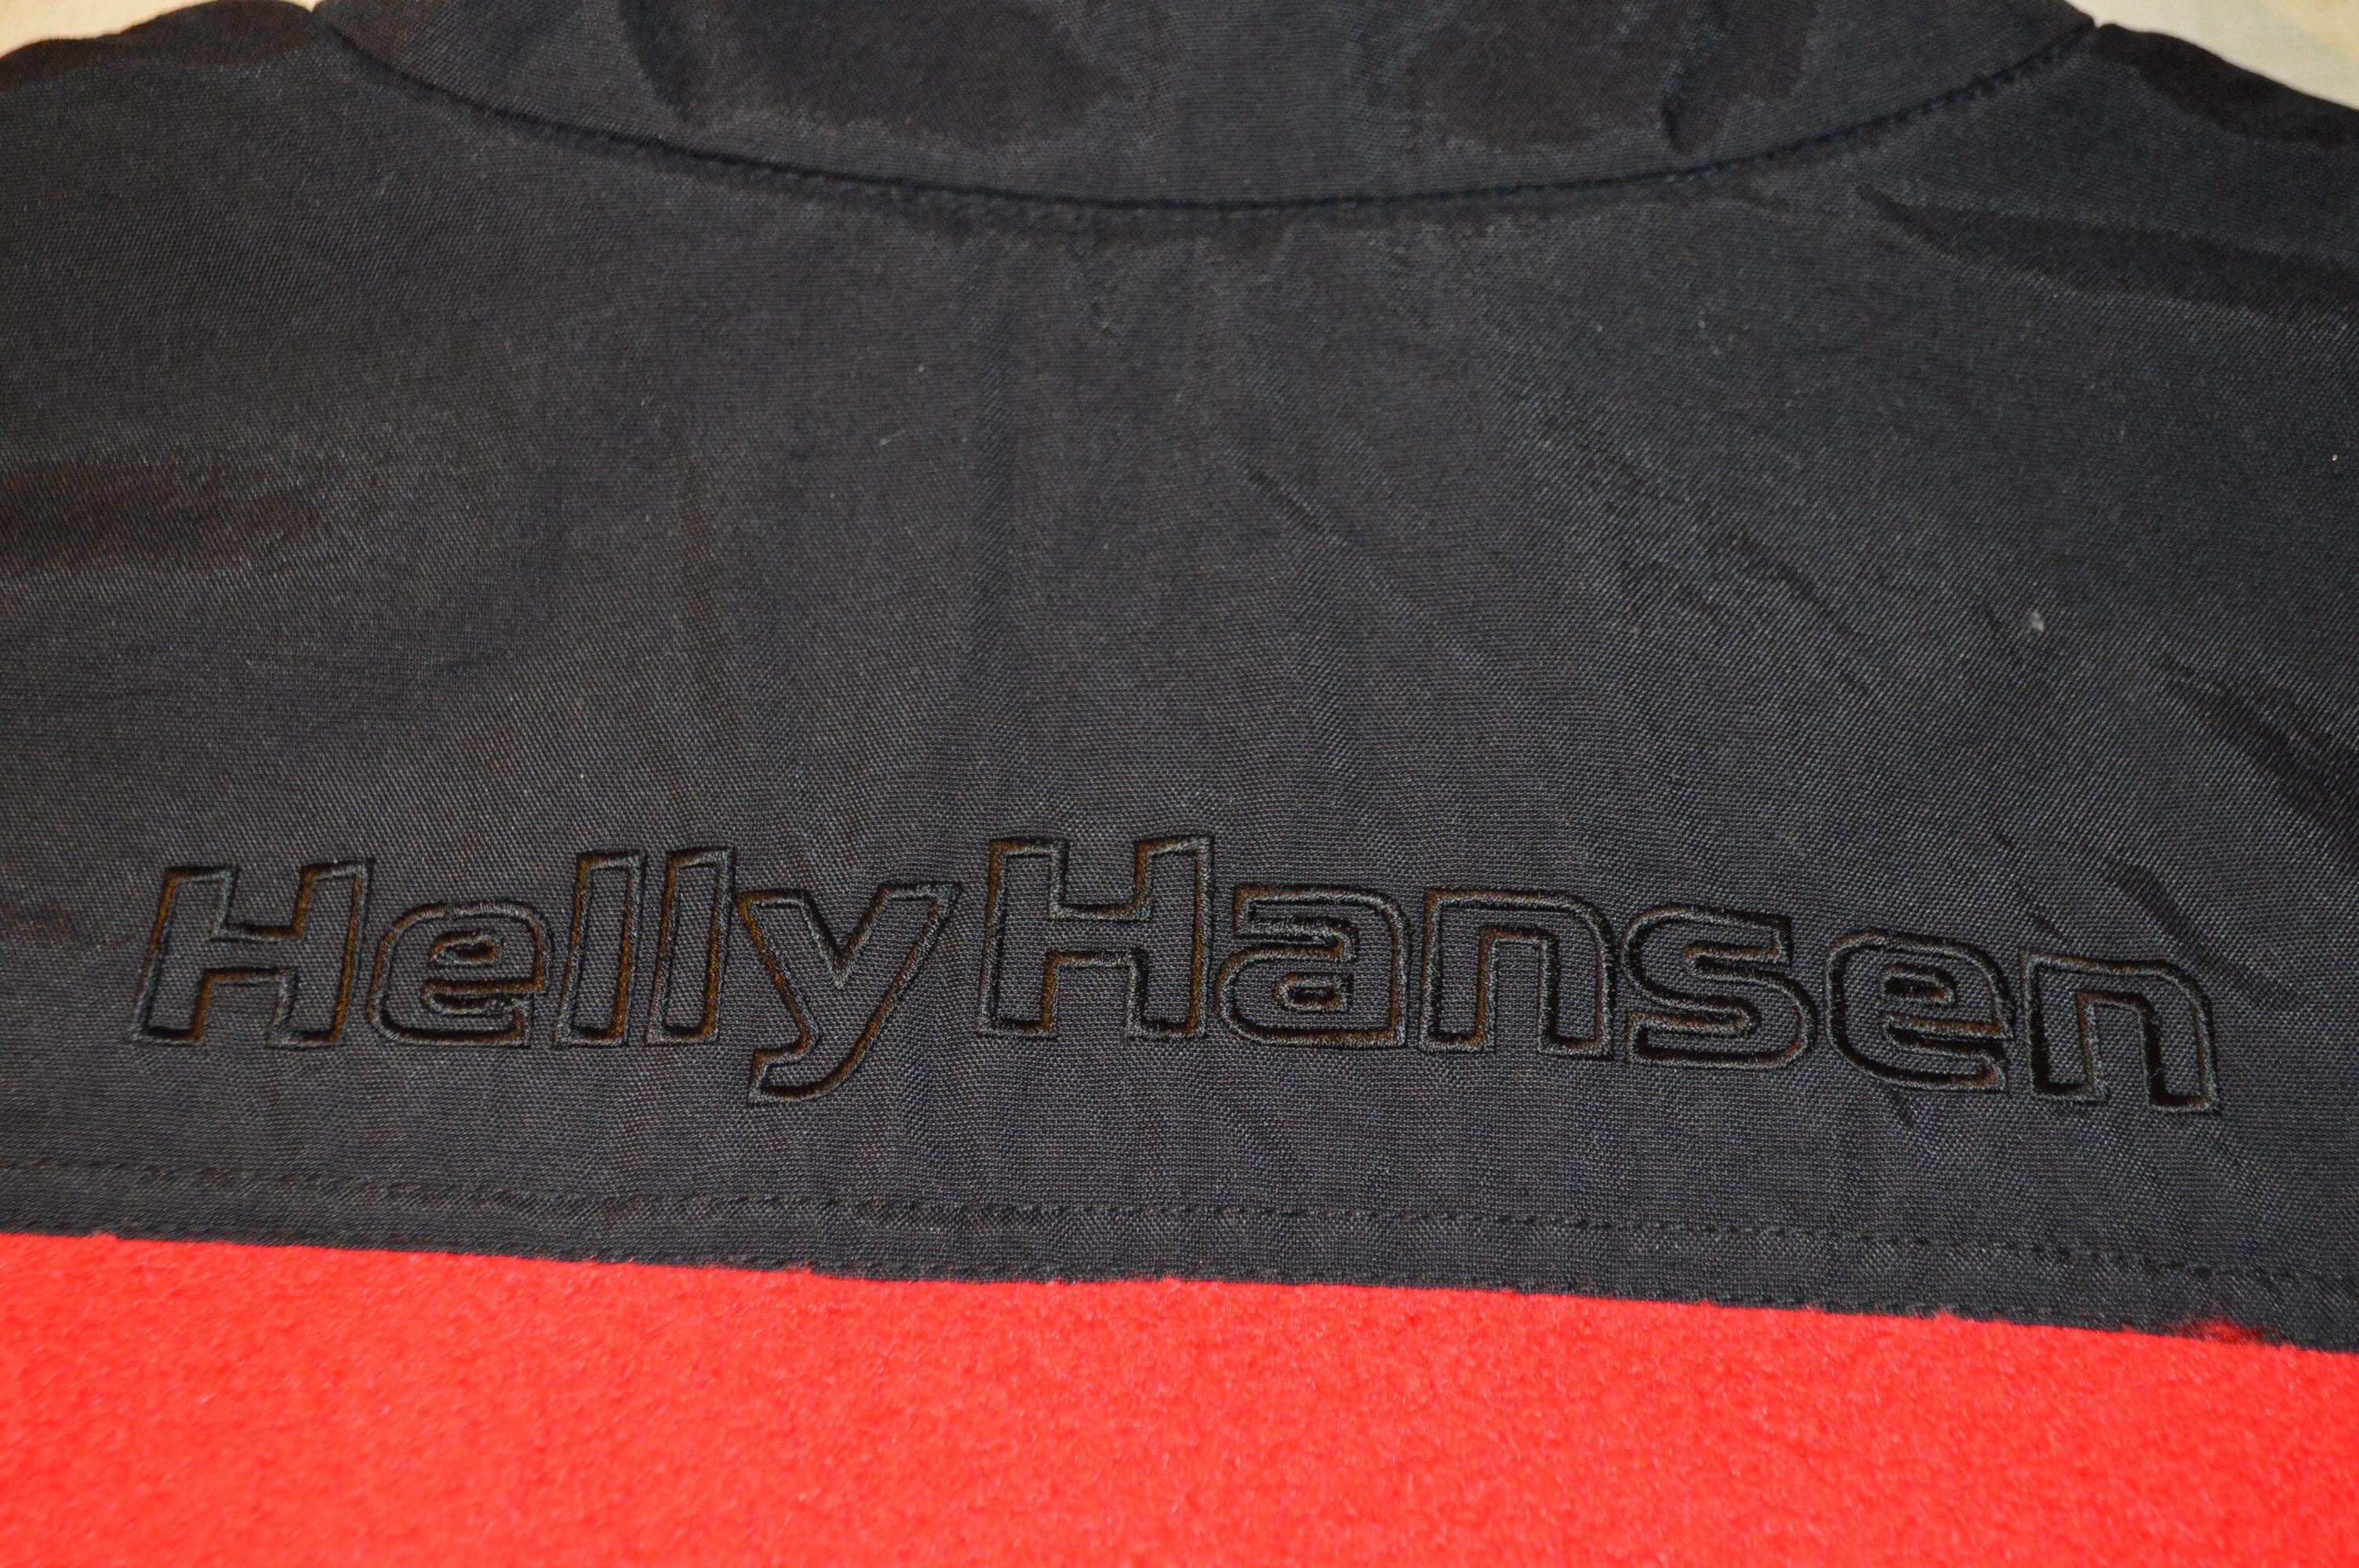 USA製 Helly Hansen ファイバーパイル×ヘリーテック ジャケット!! メンズ レディース